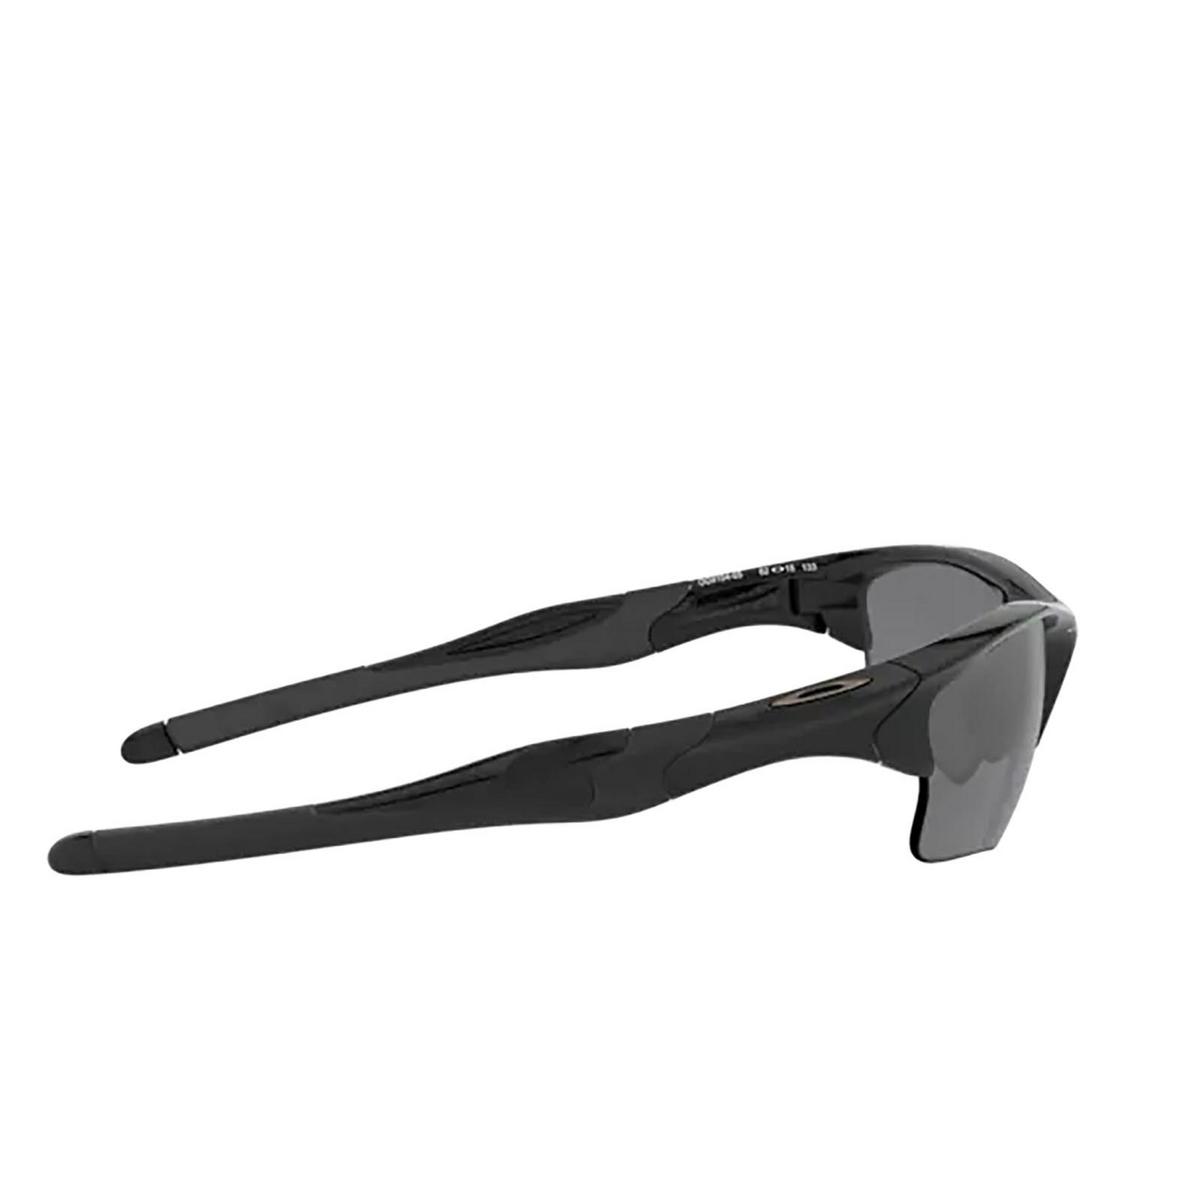 Oakley® Irregular Sunglasses: Half Jacket 2.0 Xl OO9154 color Polished Black 915405 - three-quarters view.